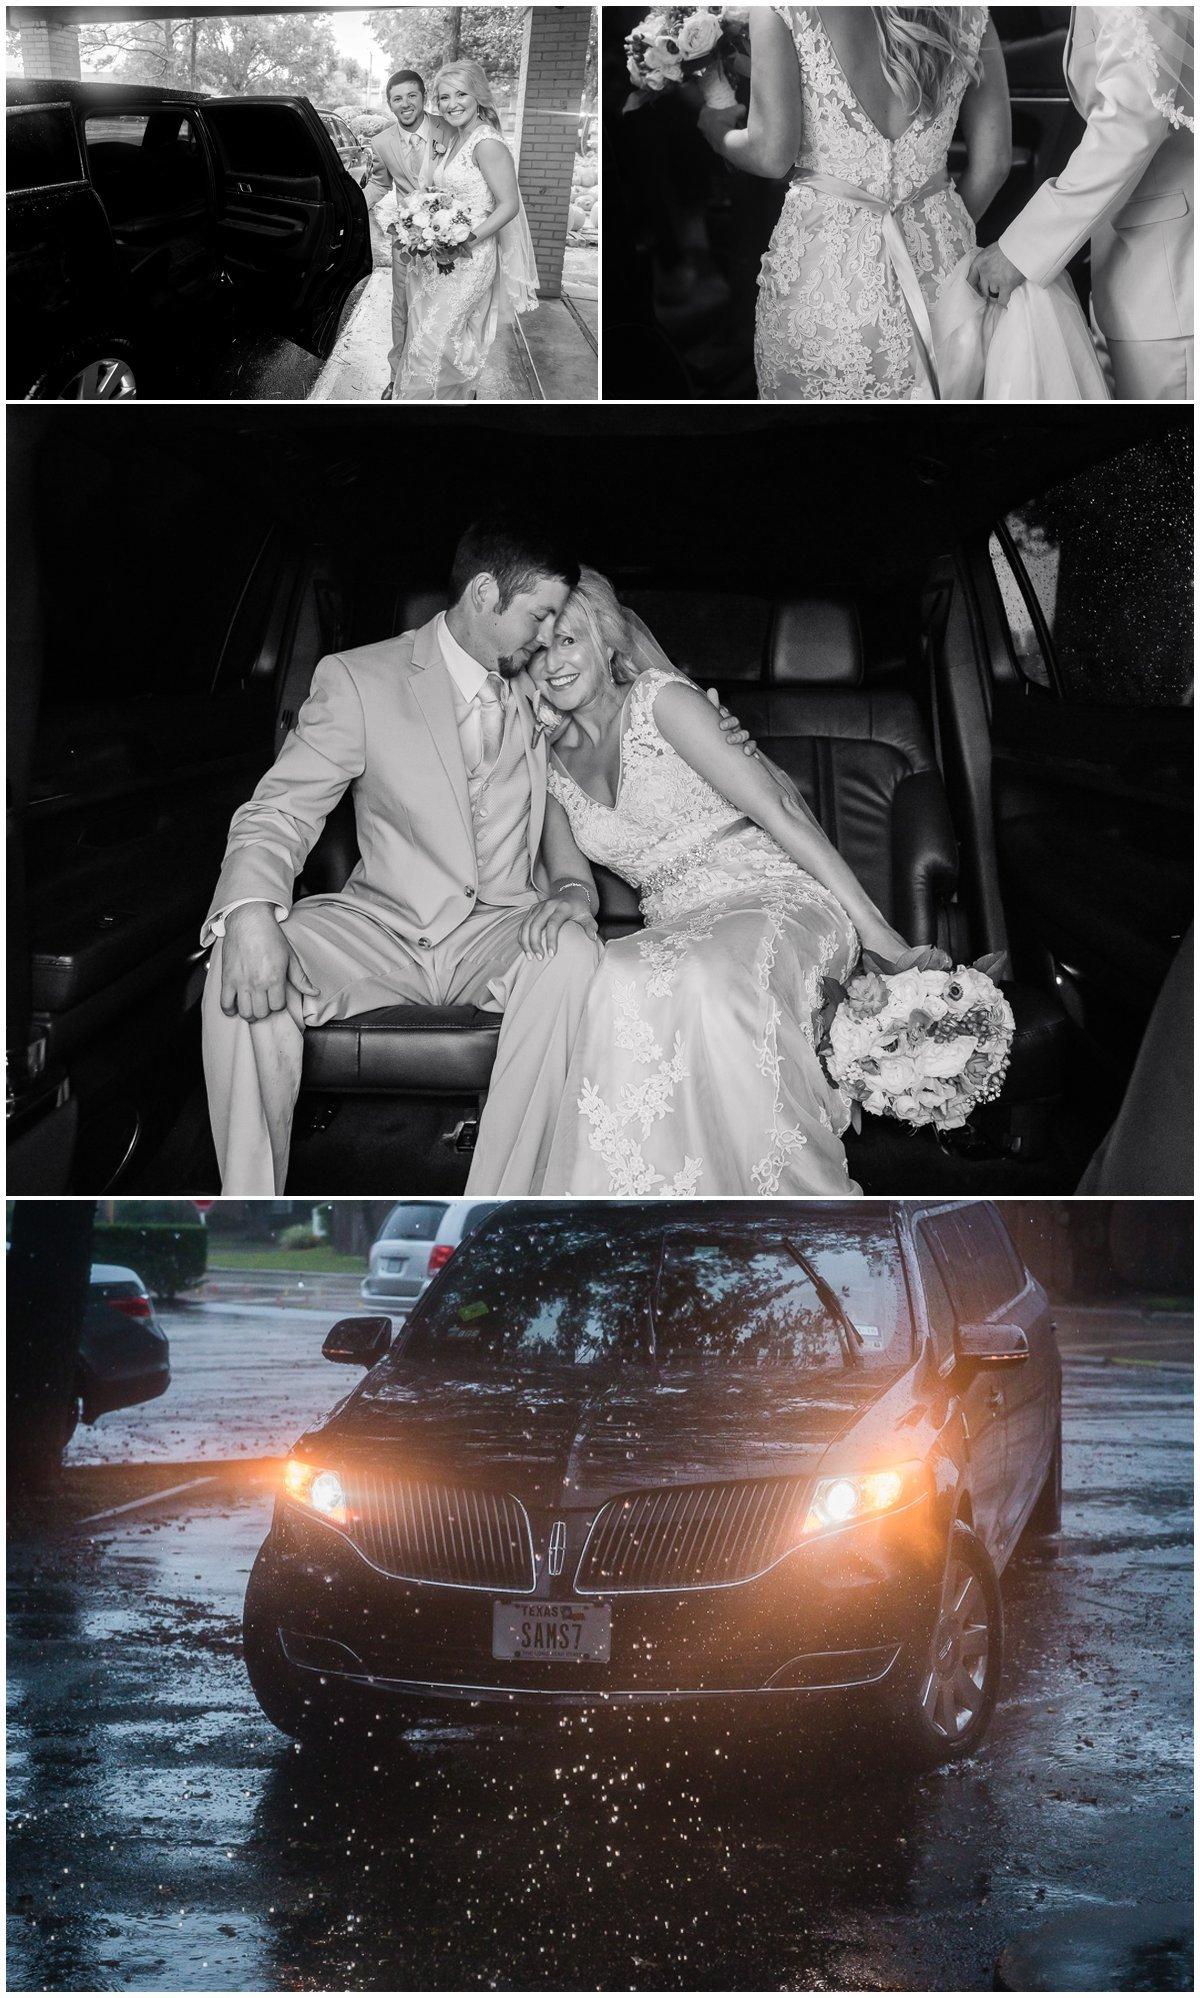 Becca-Tony-Houston-Wedding-The Admiral on Clear Lake 56